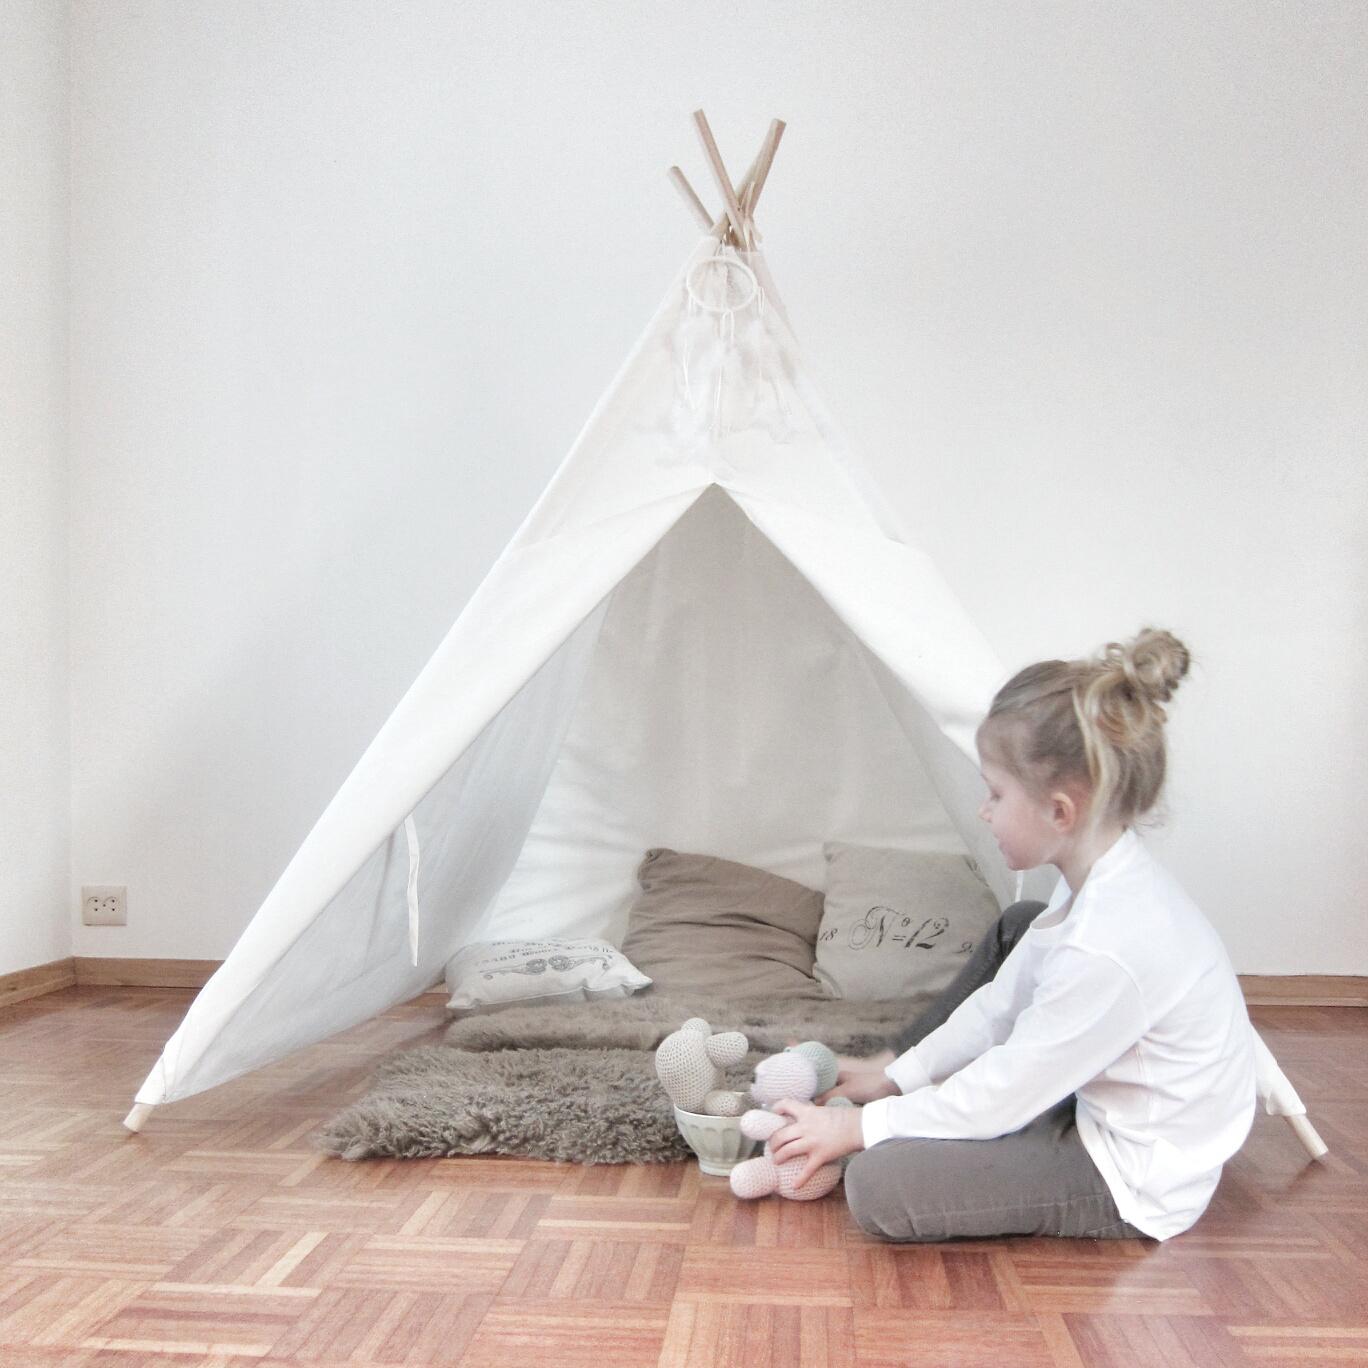 Barnerom Tipi: Tipi barneseng barnerom soverom. Jox details leketelt tipi gr? telt.